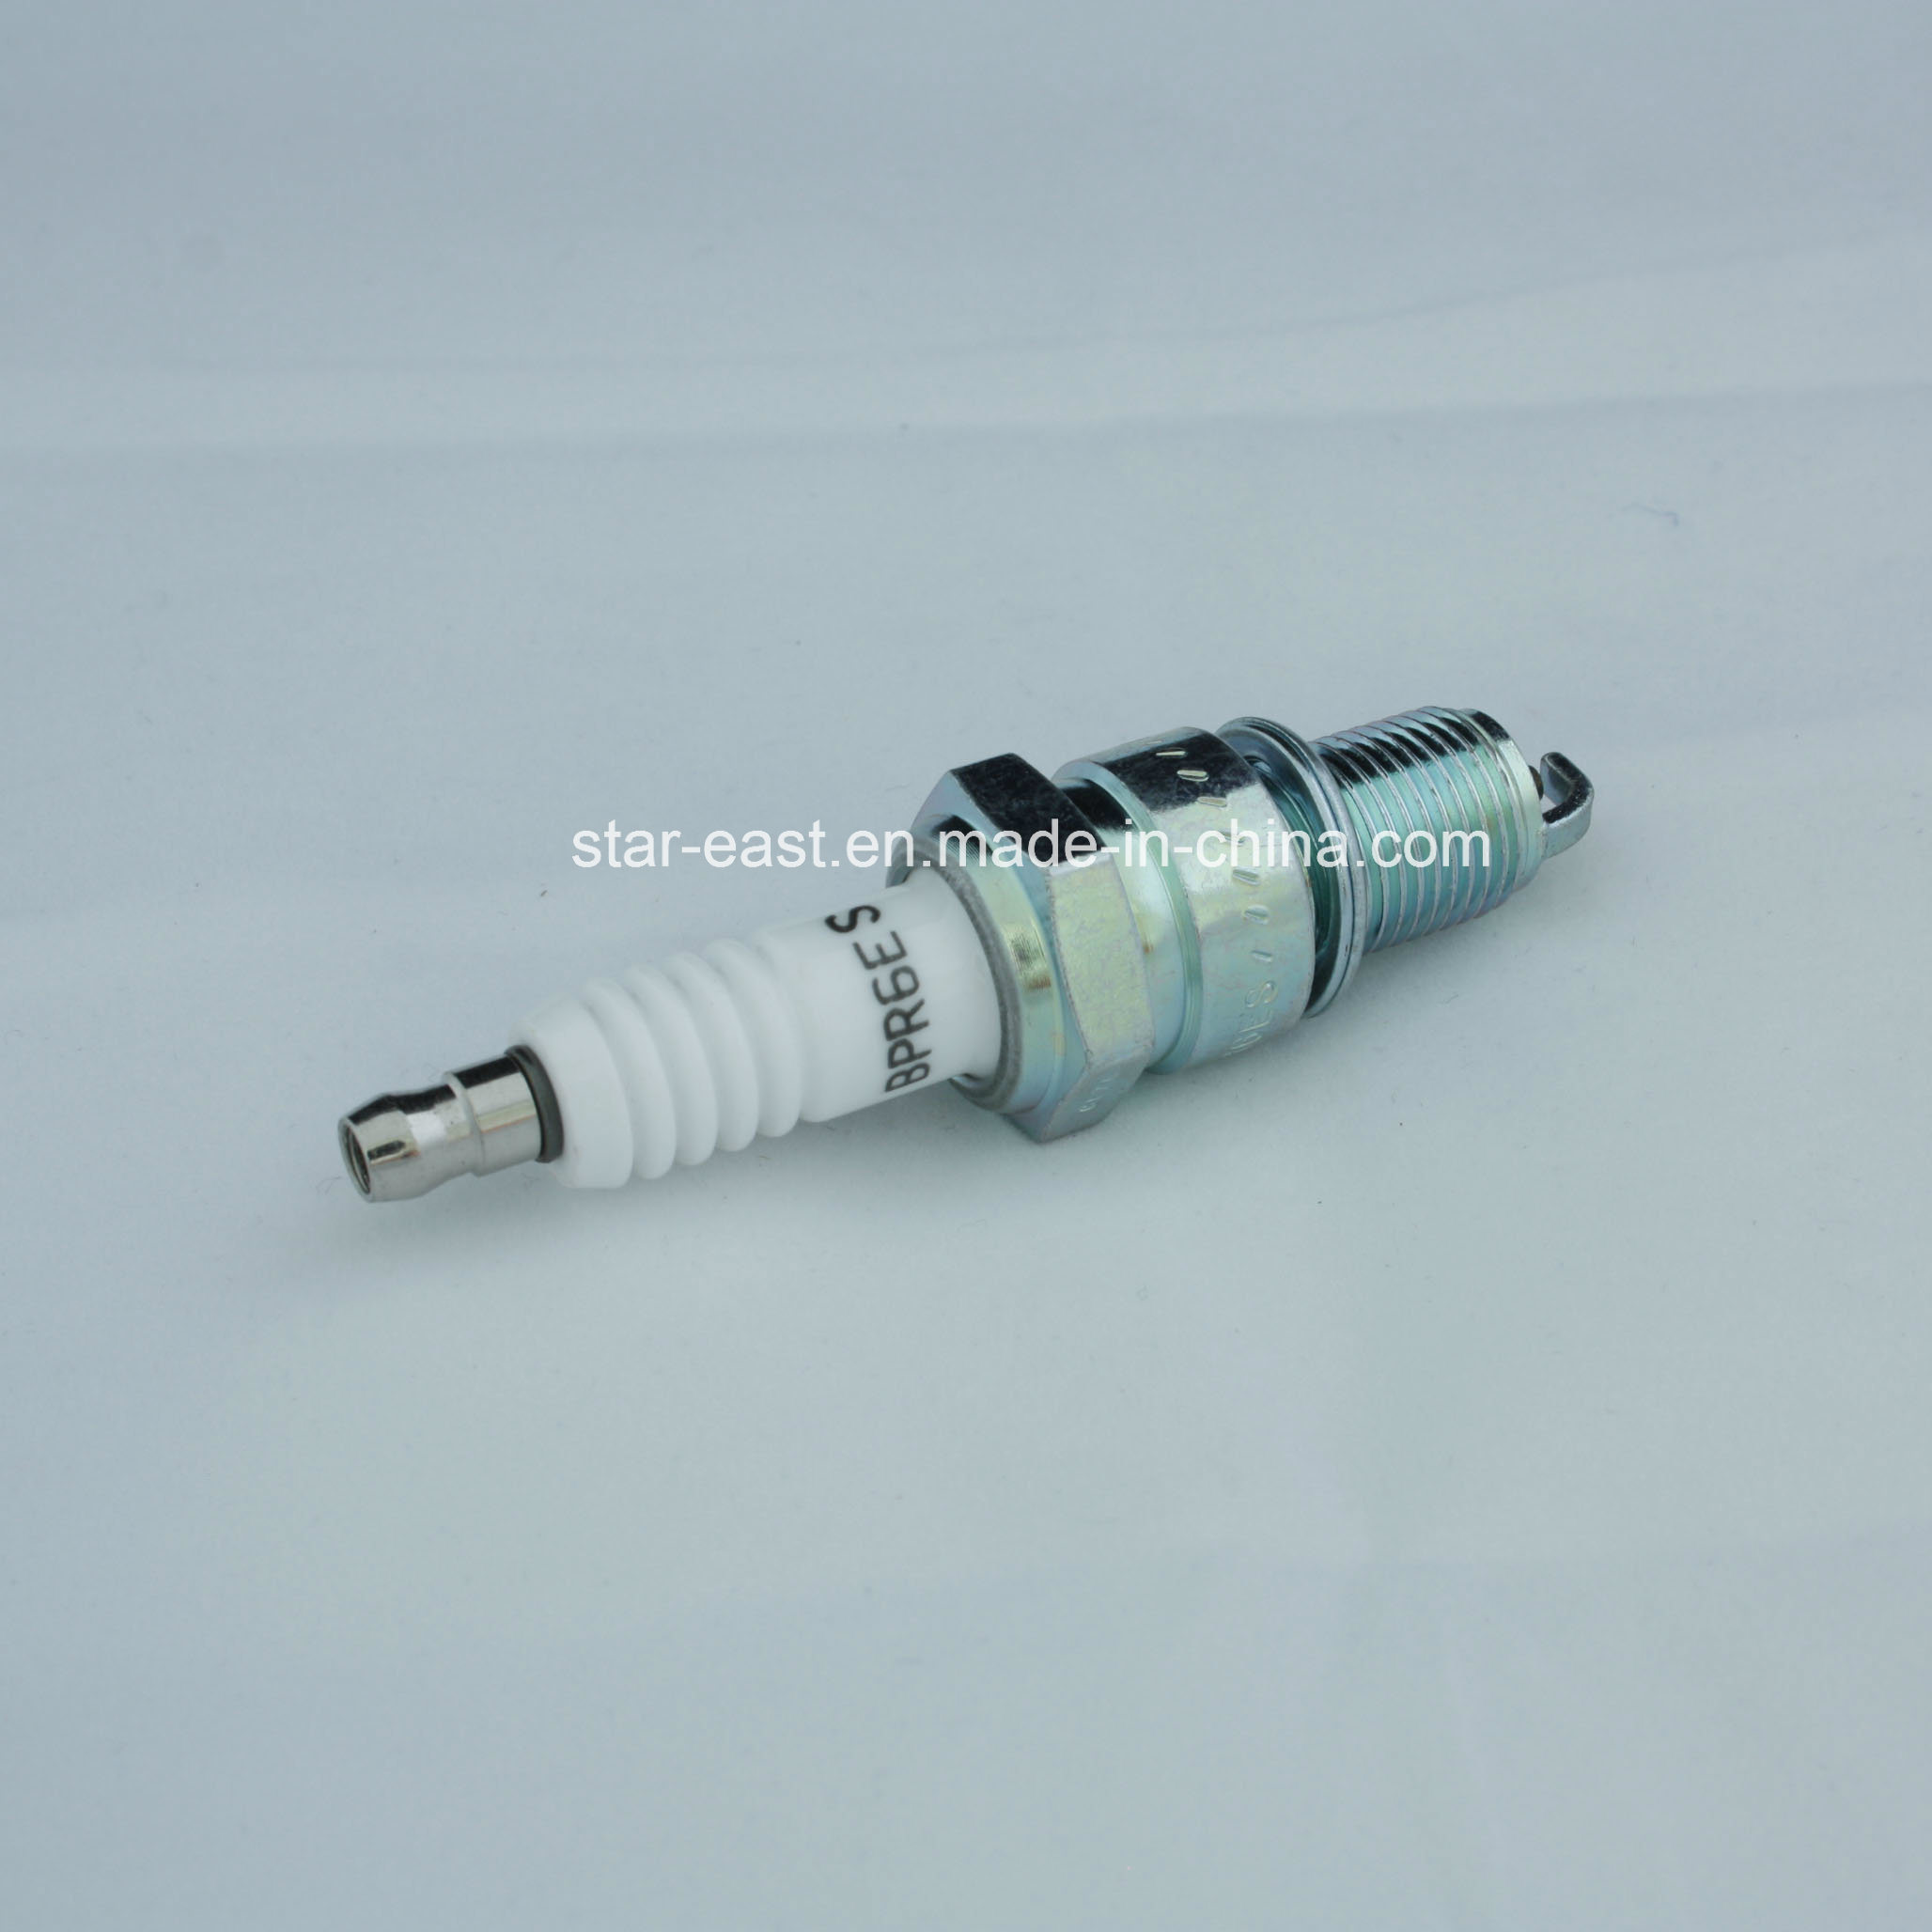 Hight Quality Spark Plug for Ngk Bpr6es Toyota/Mazda/Nissan